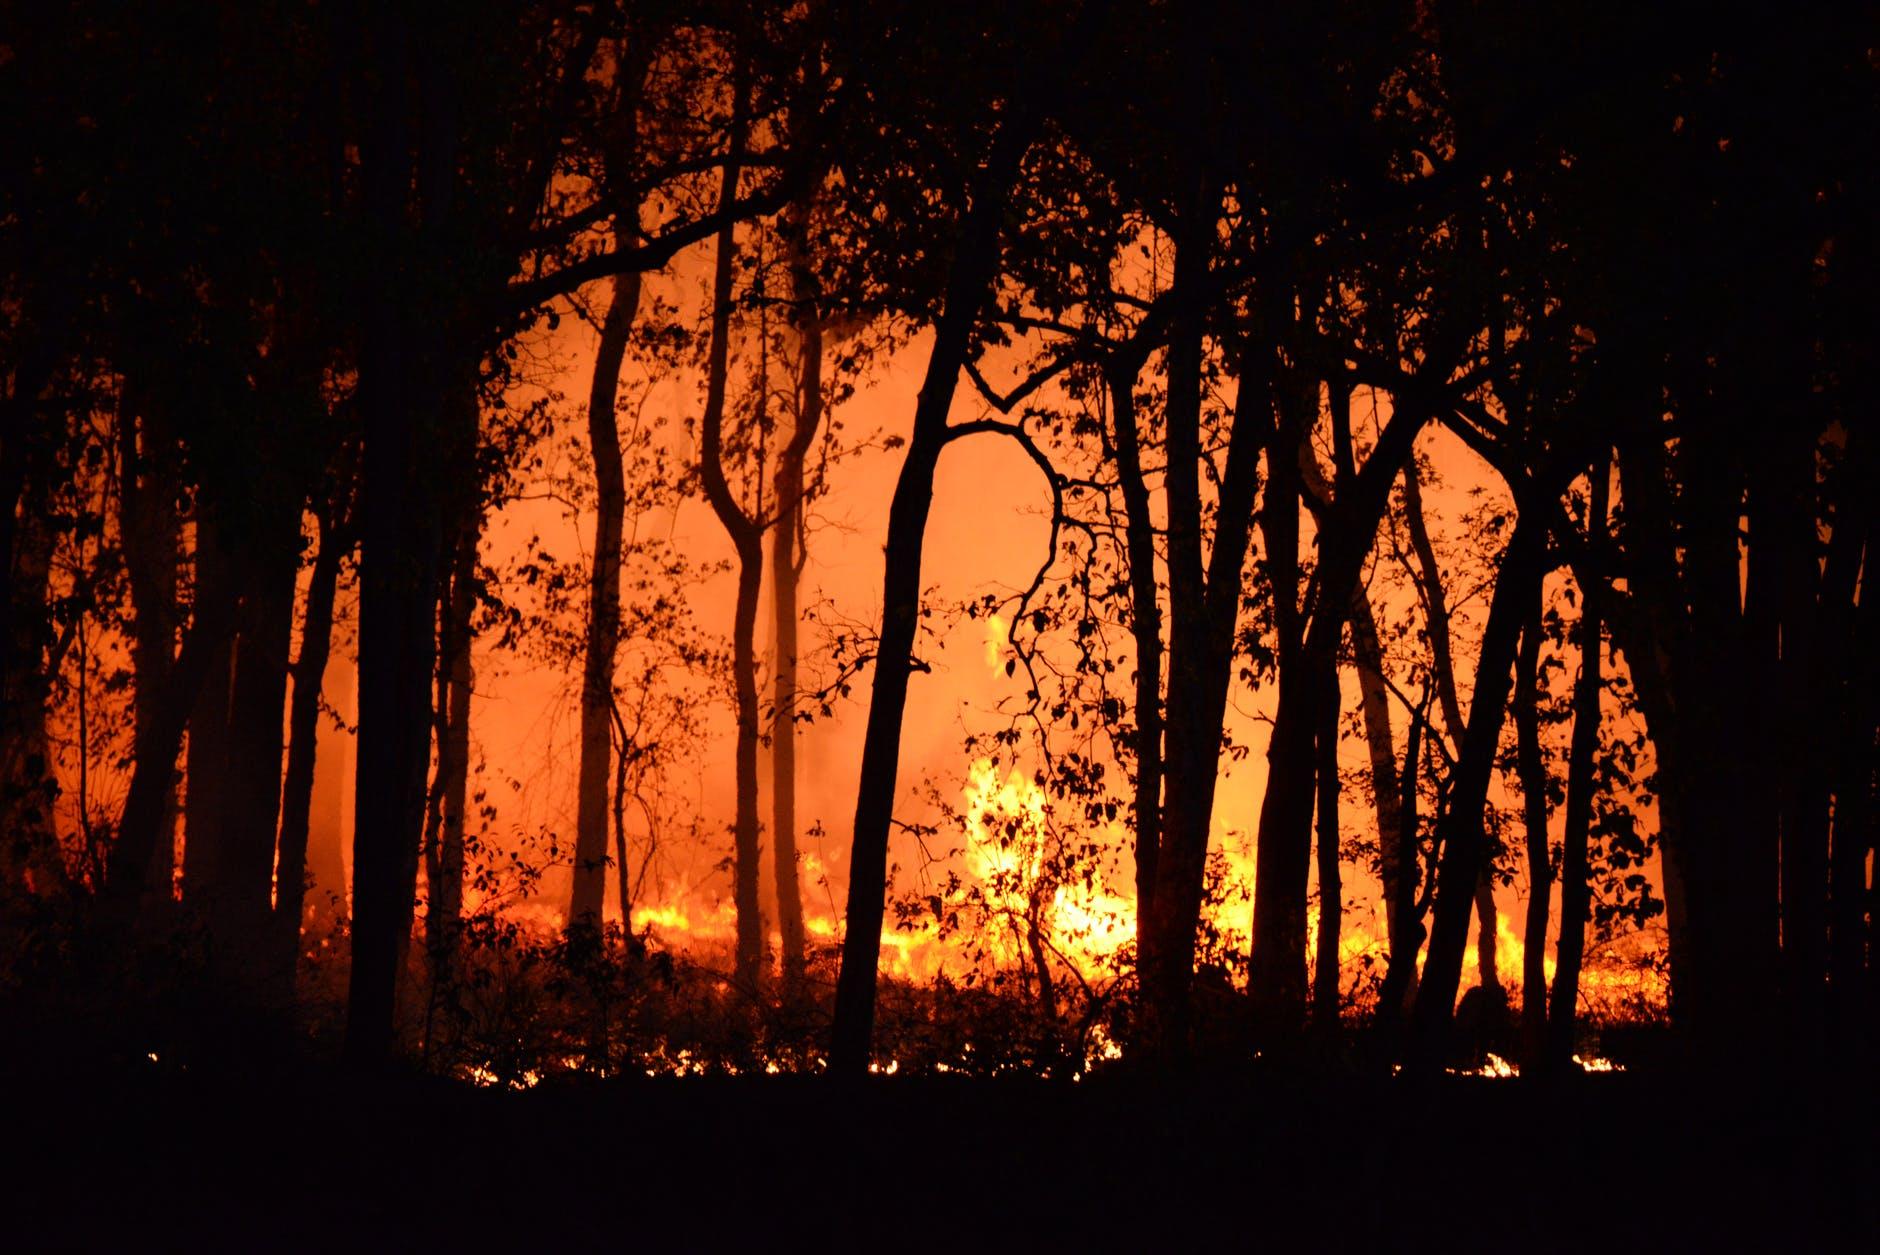 photo of burning forest